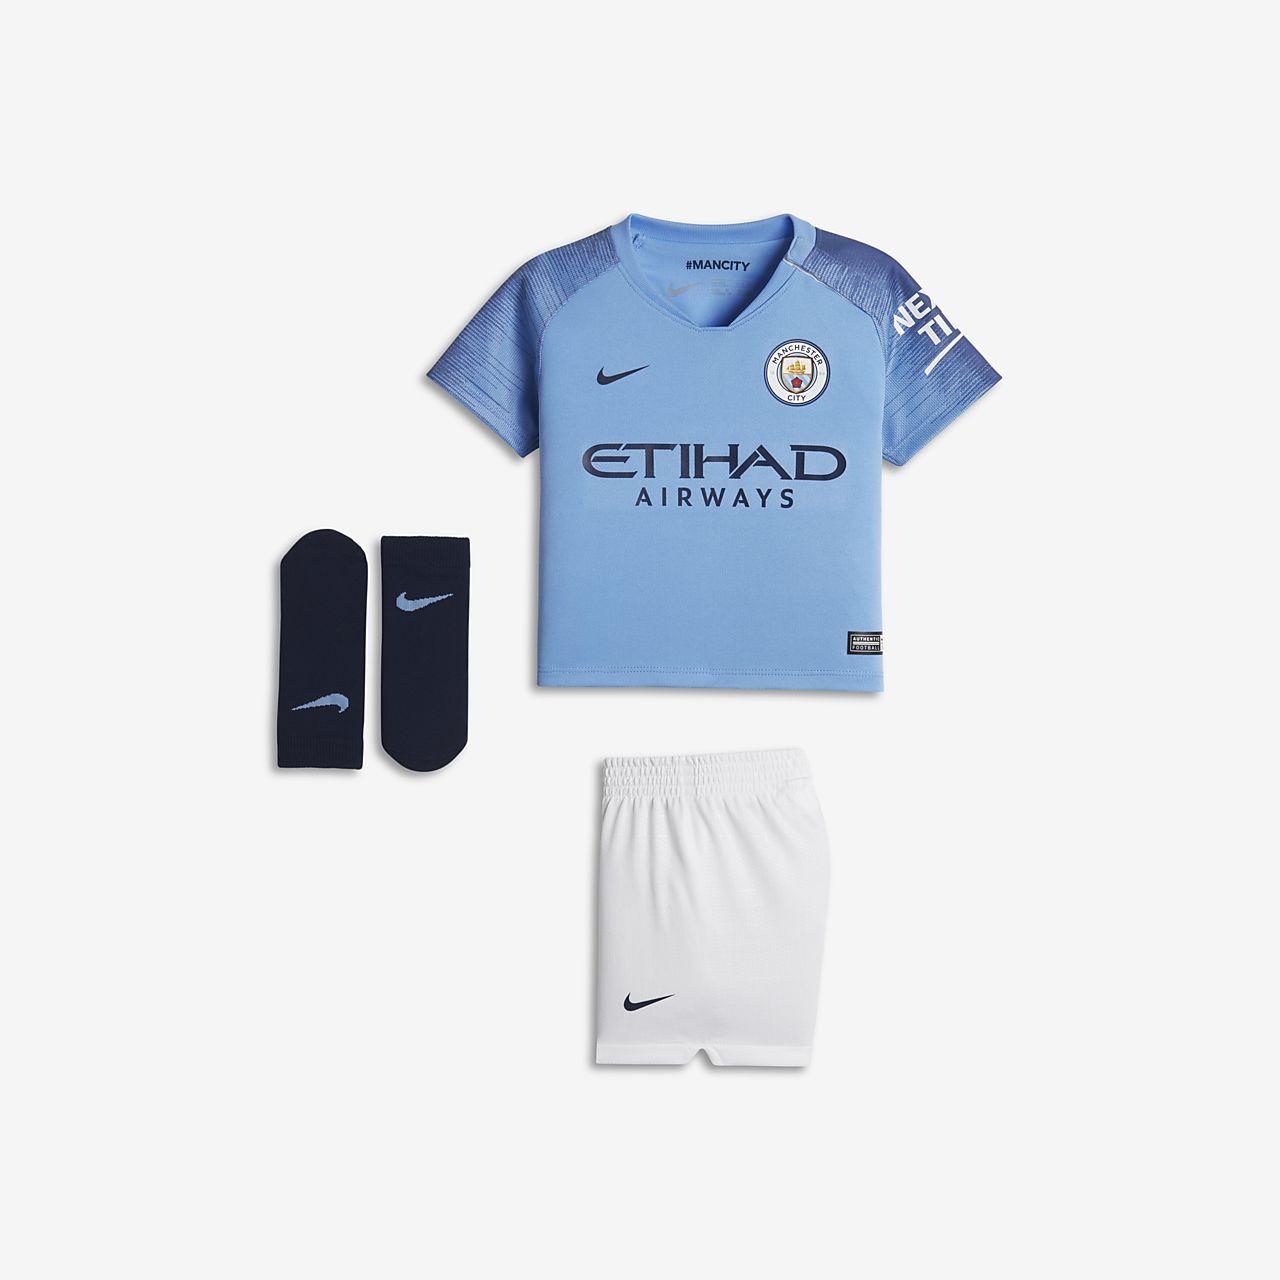 a84f7c881 ... Kit de fútbol para bebé e infantil de local Stadium del Manchester City  FC 2018